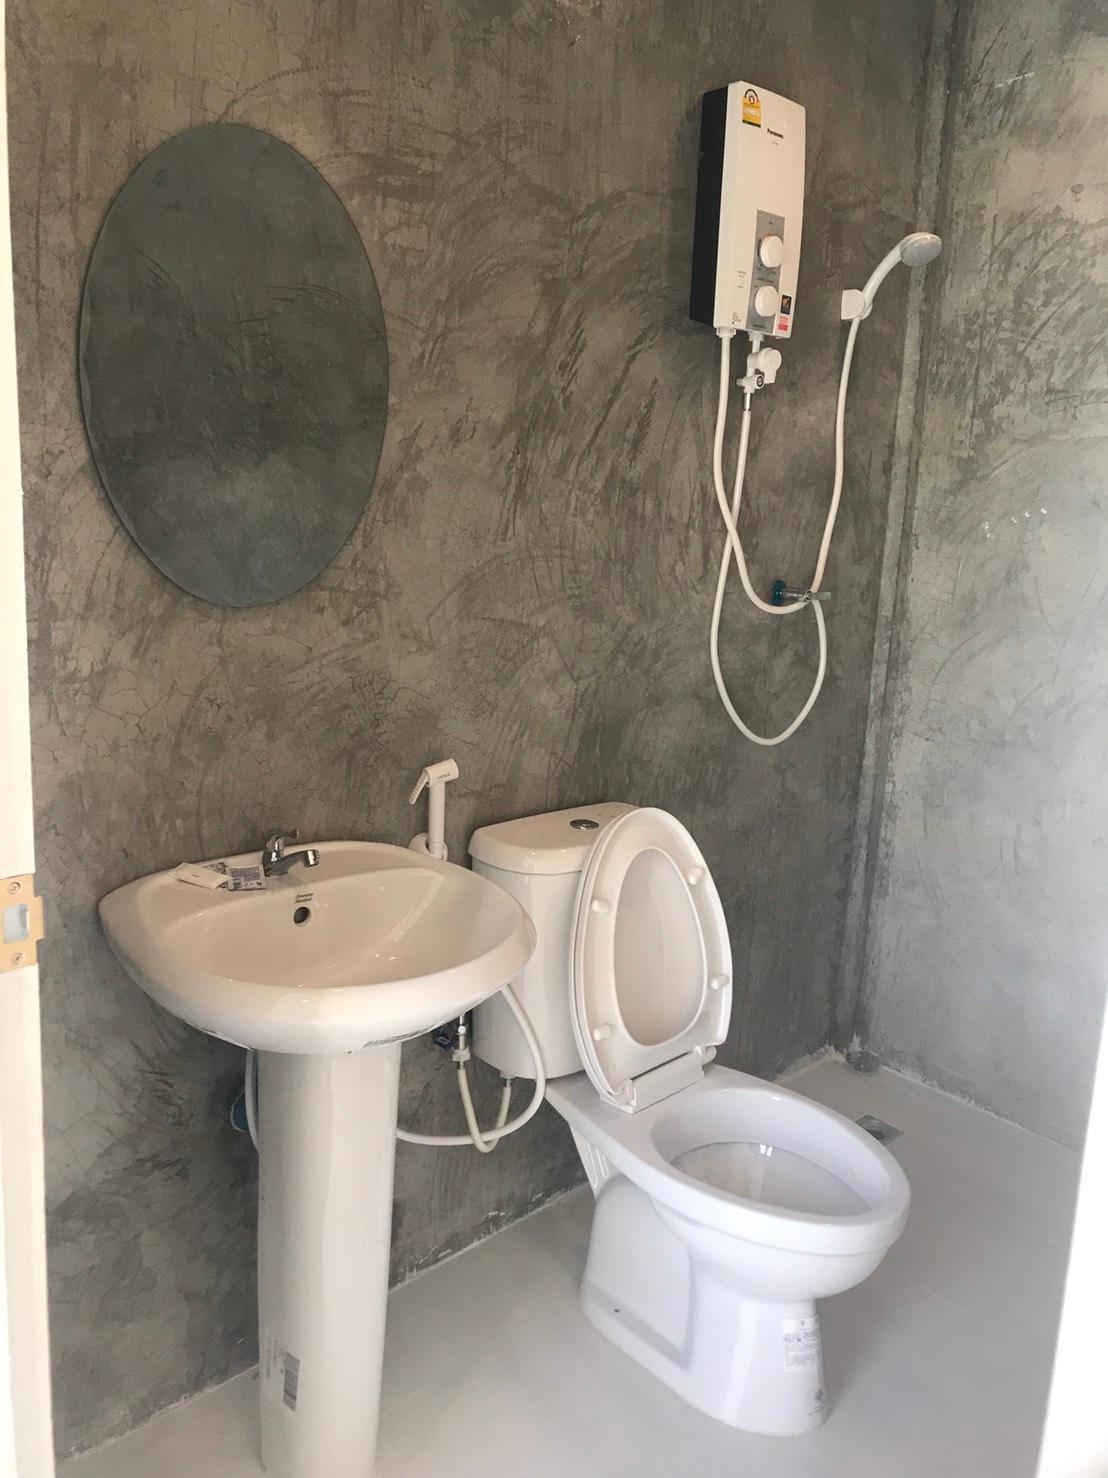 Mega resort hotel บ้านเดี่ยว 1 ห้องนอน 1 ห้องน้ำส่วนตัว ขนาด 18 ตร.ม. – บ้านไผ่